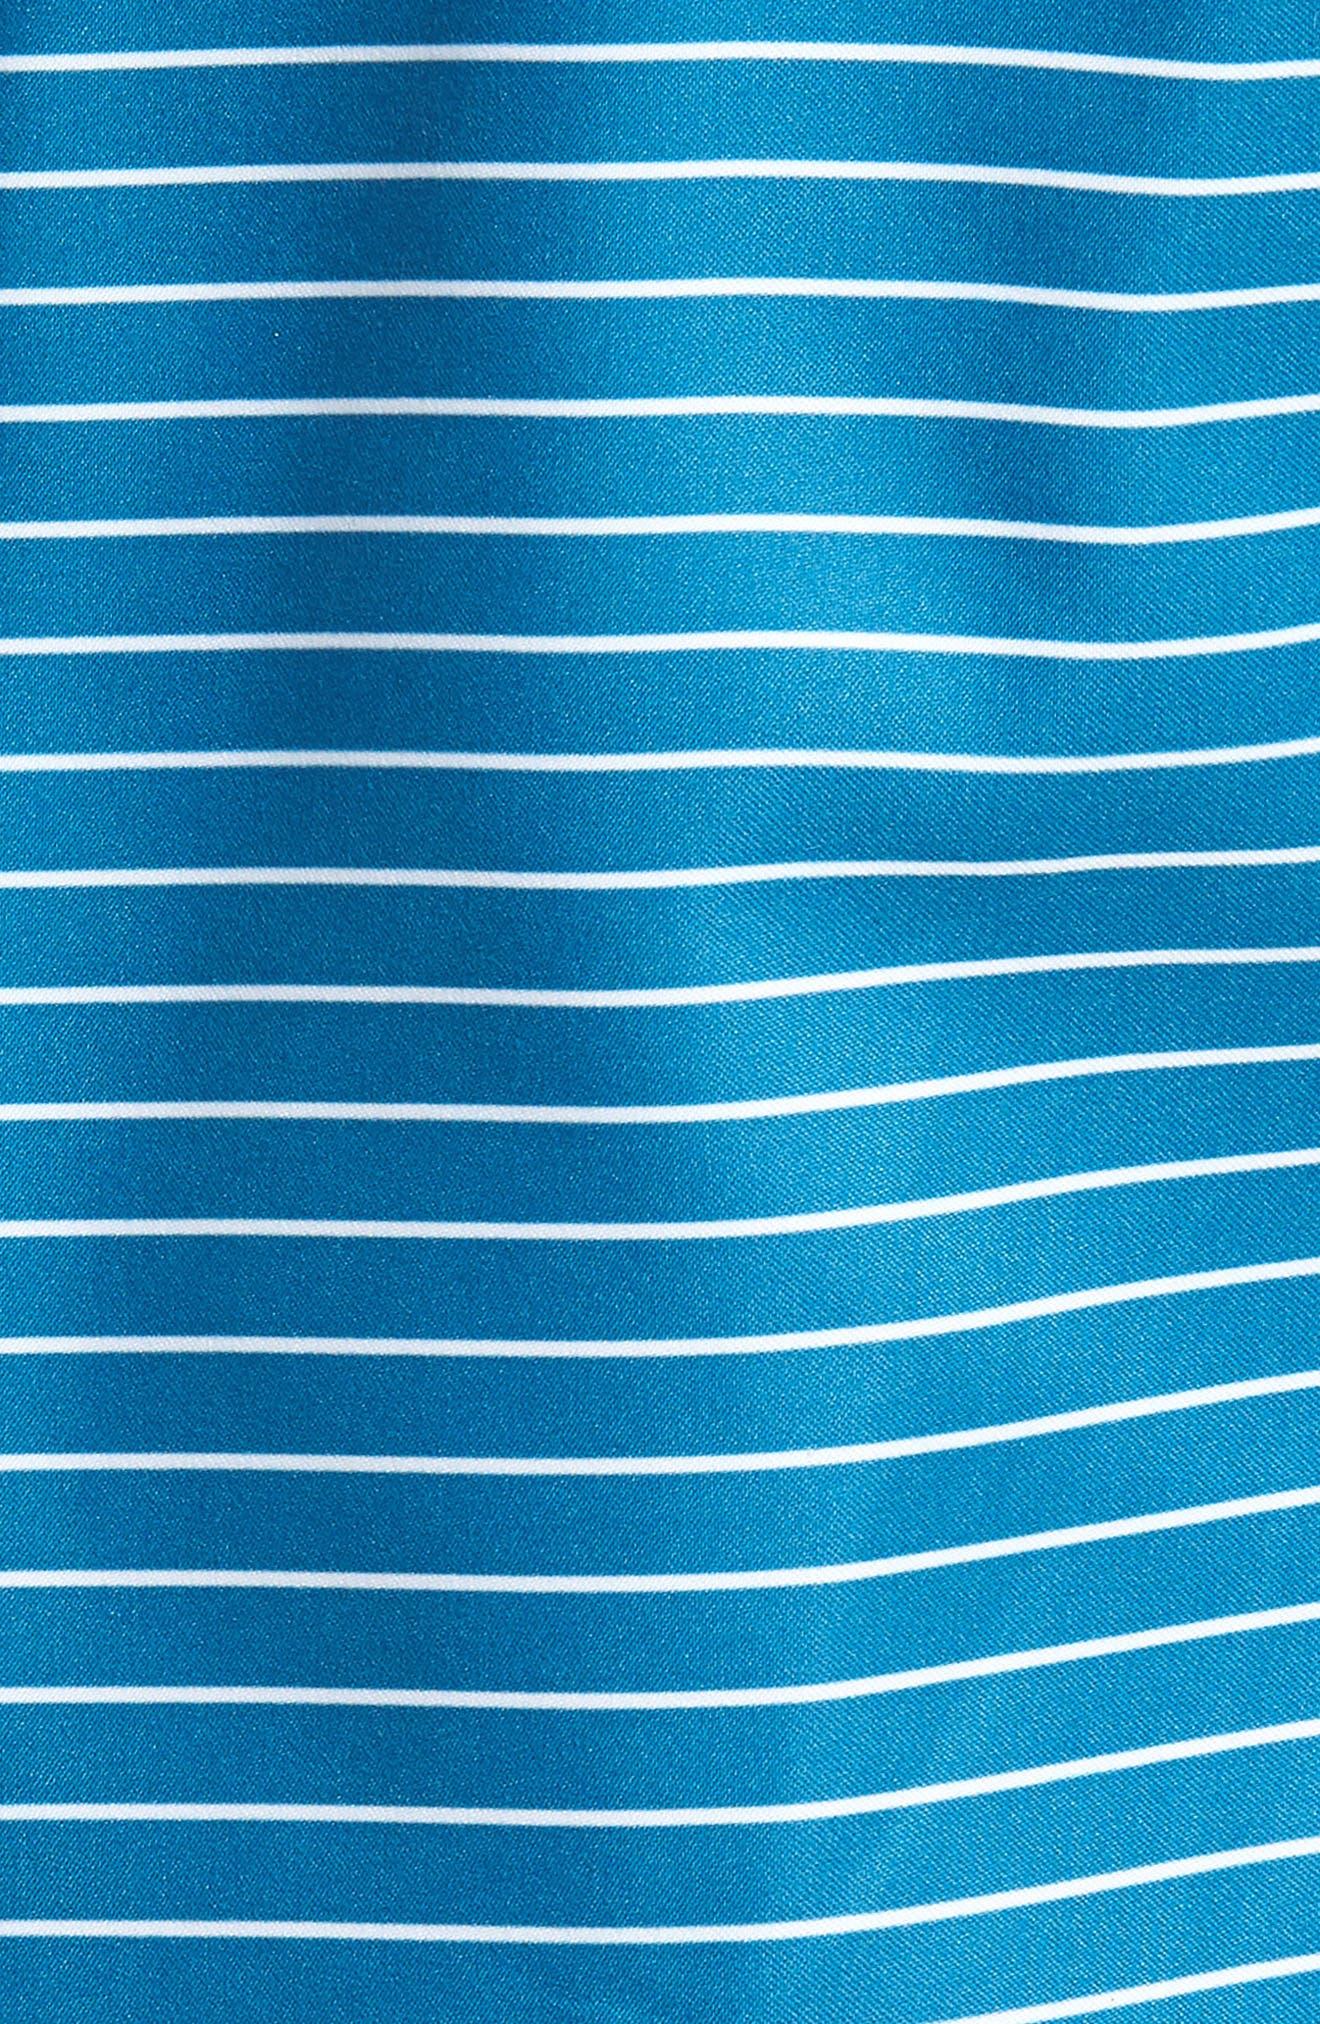 Boost Swim Trunks,                             Alternate thumbnail 5, color,                             Teal